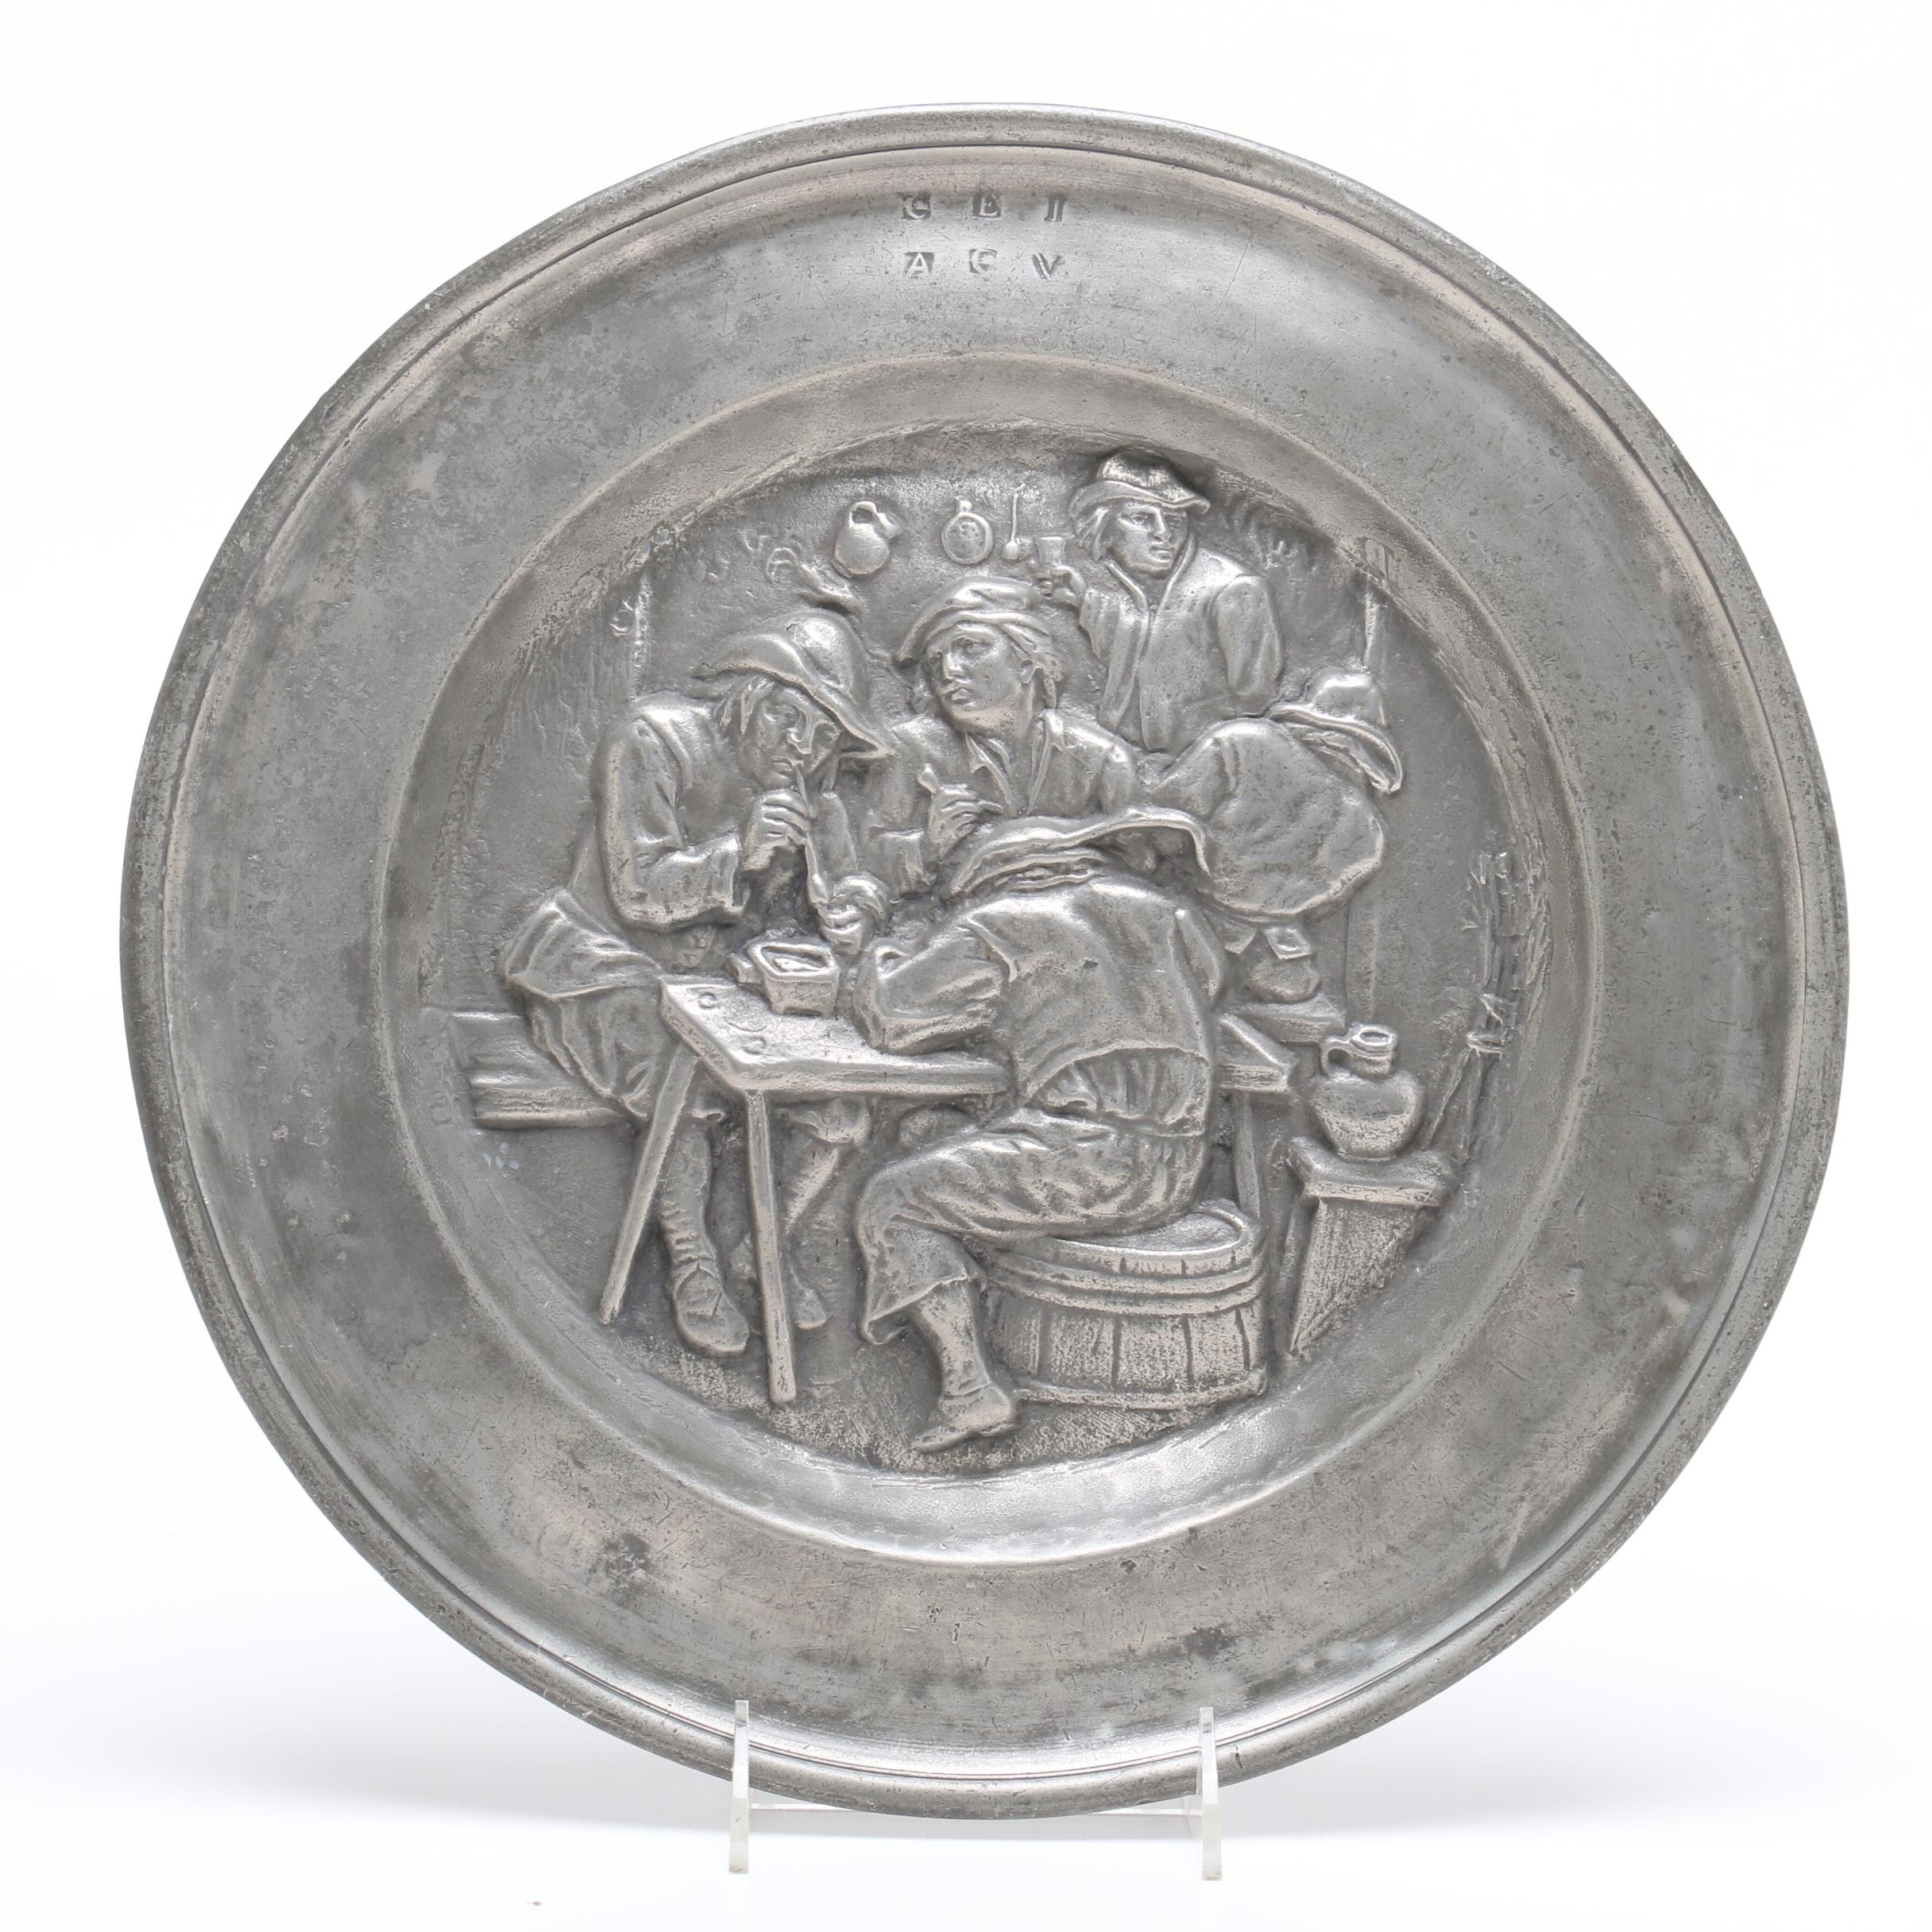 Decorative Mid-Century Era Tavern or Pub Scene Pewter Hanging Plate